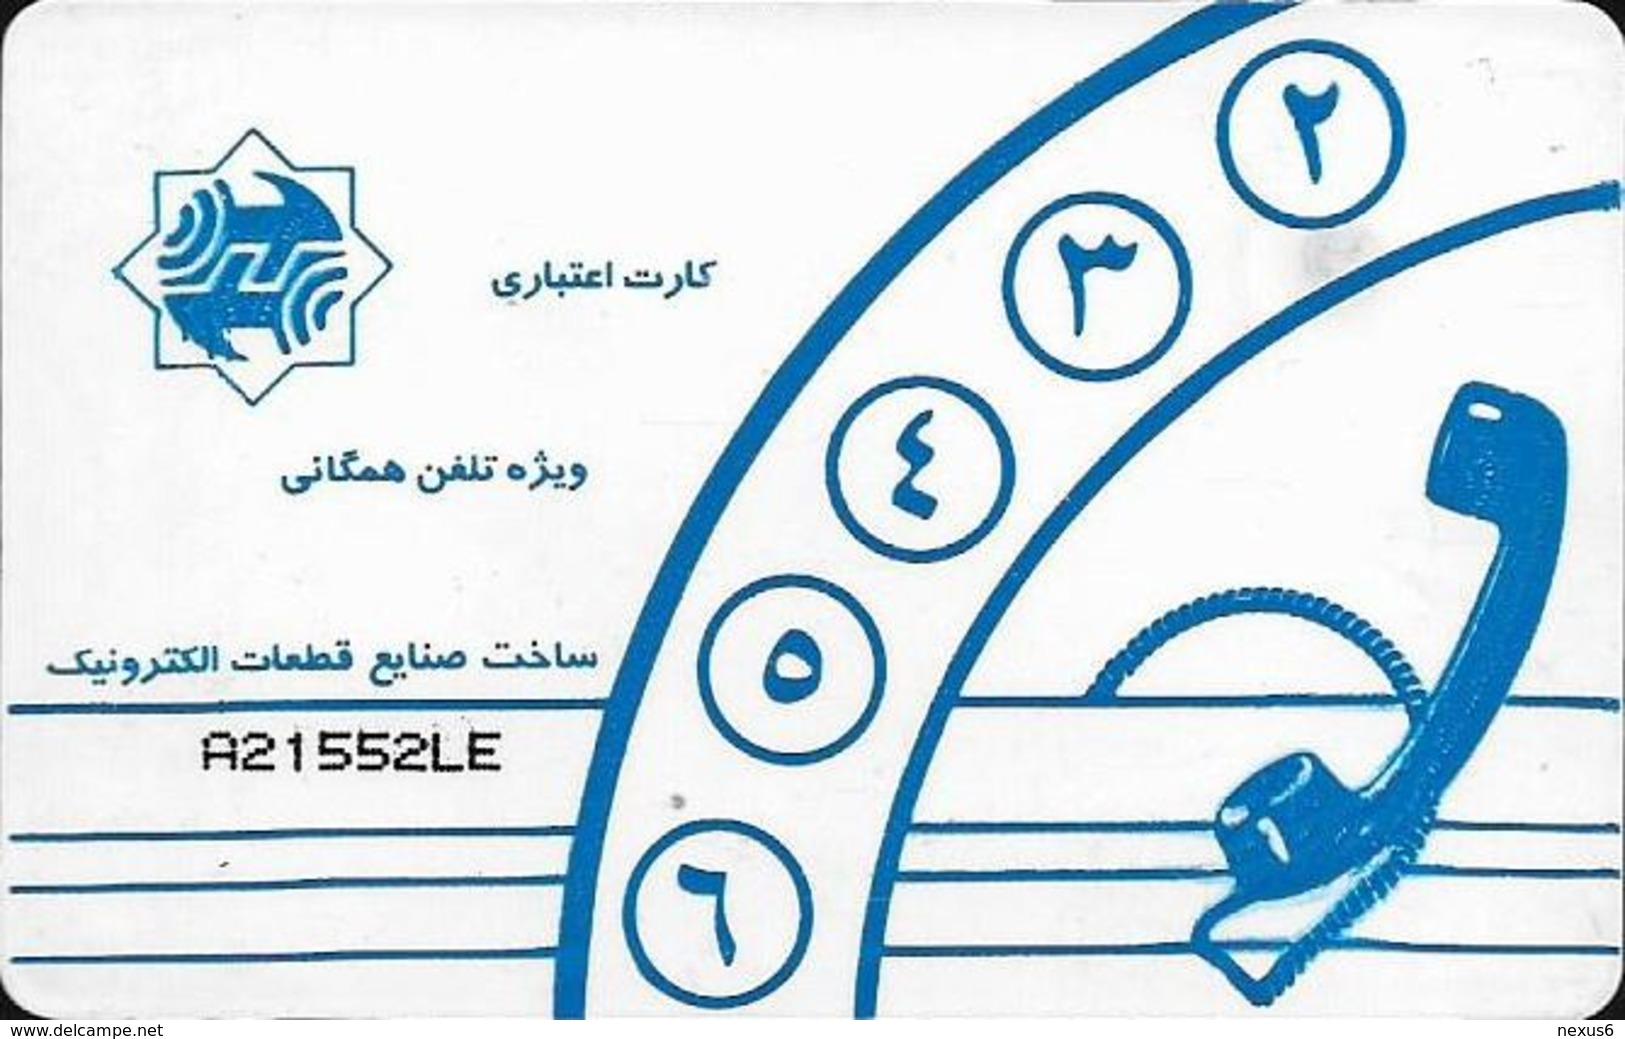 Iran - Iran Telecom - Blue Tulips & Dove (Iran Telecom On Corner) Chip Afnor TH02, Cn. On Backside, Used - Iran